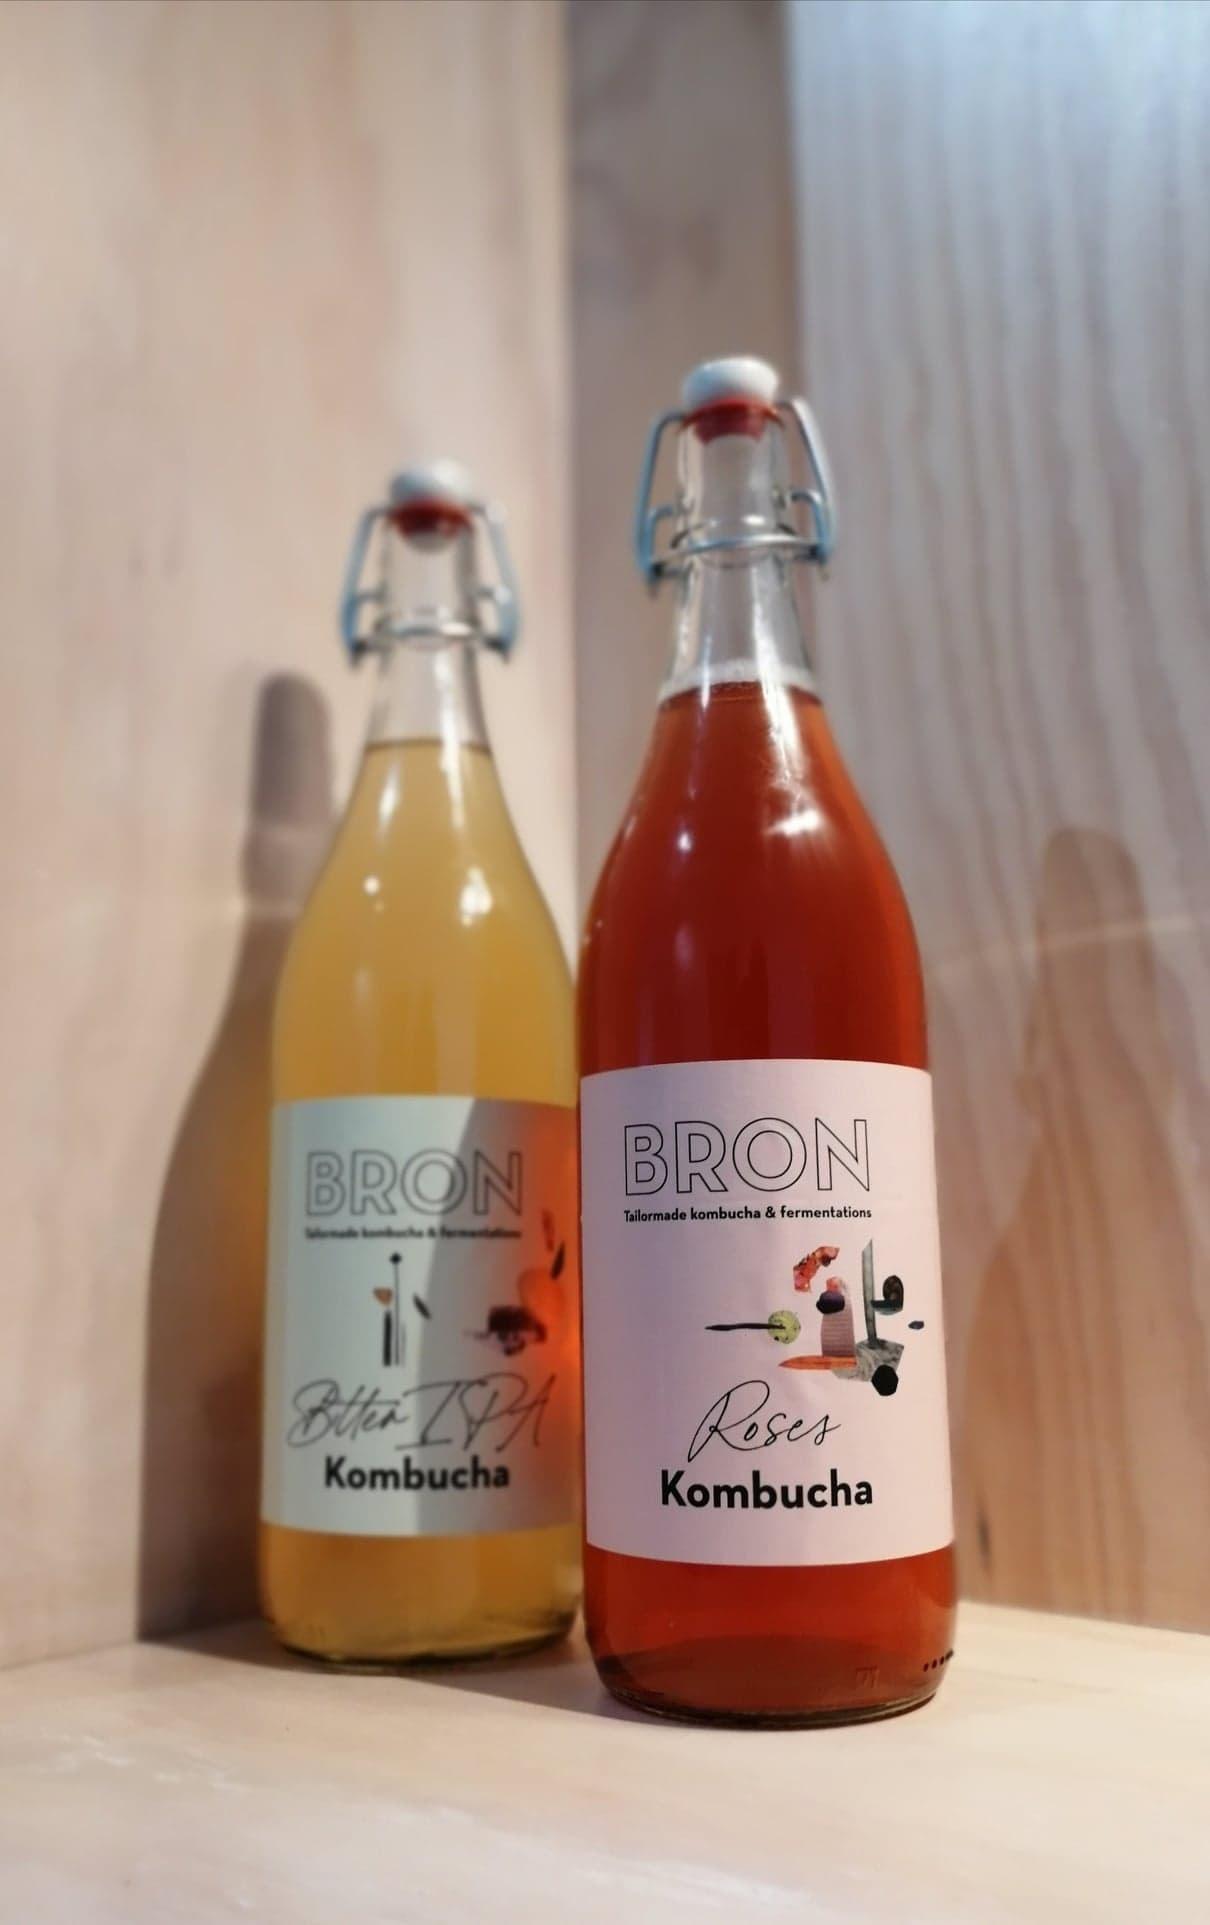 Kombucha - Bron van smaak